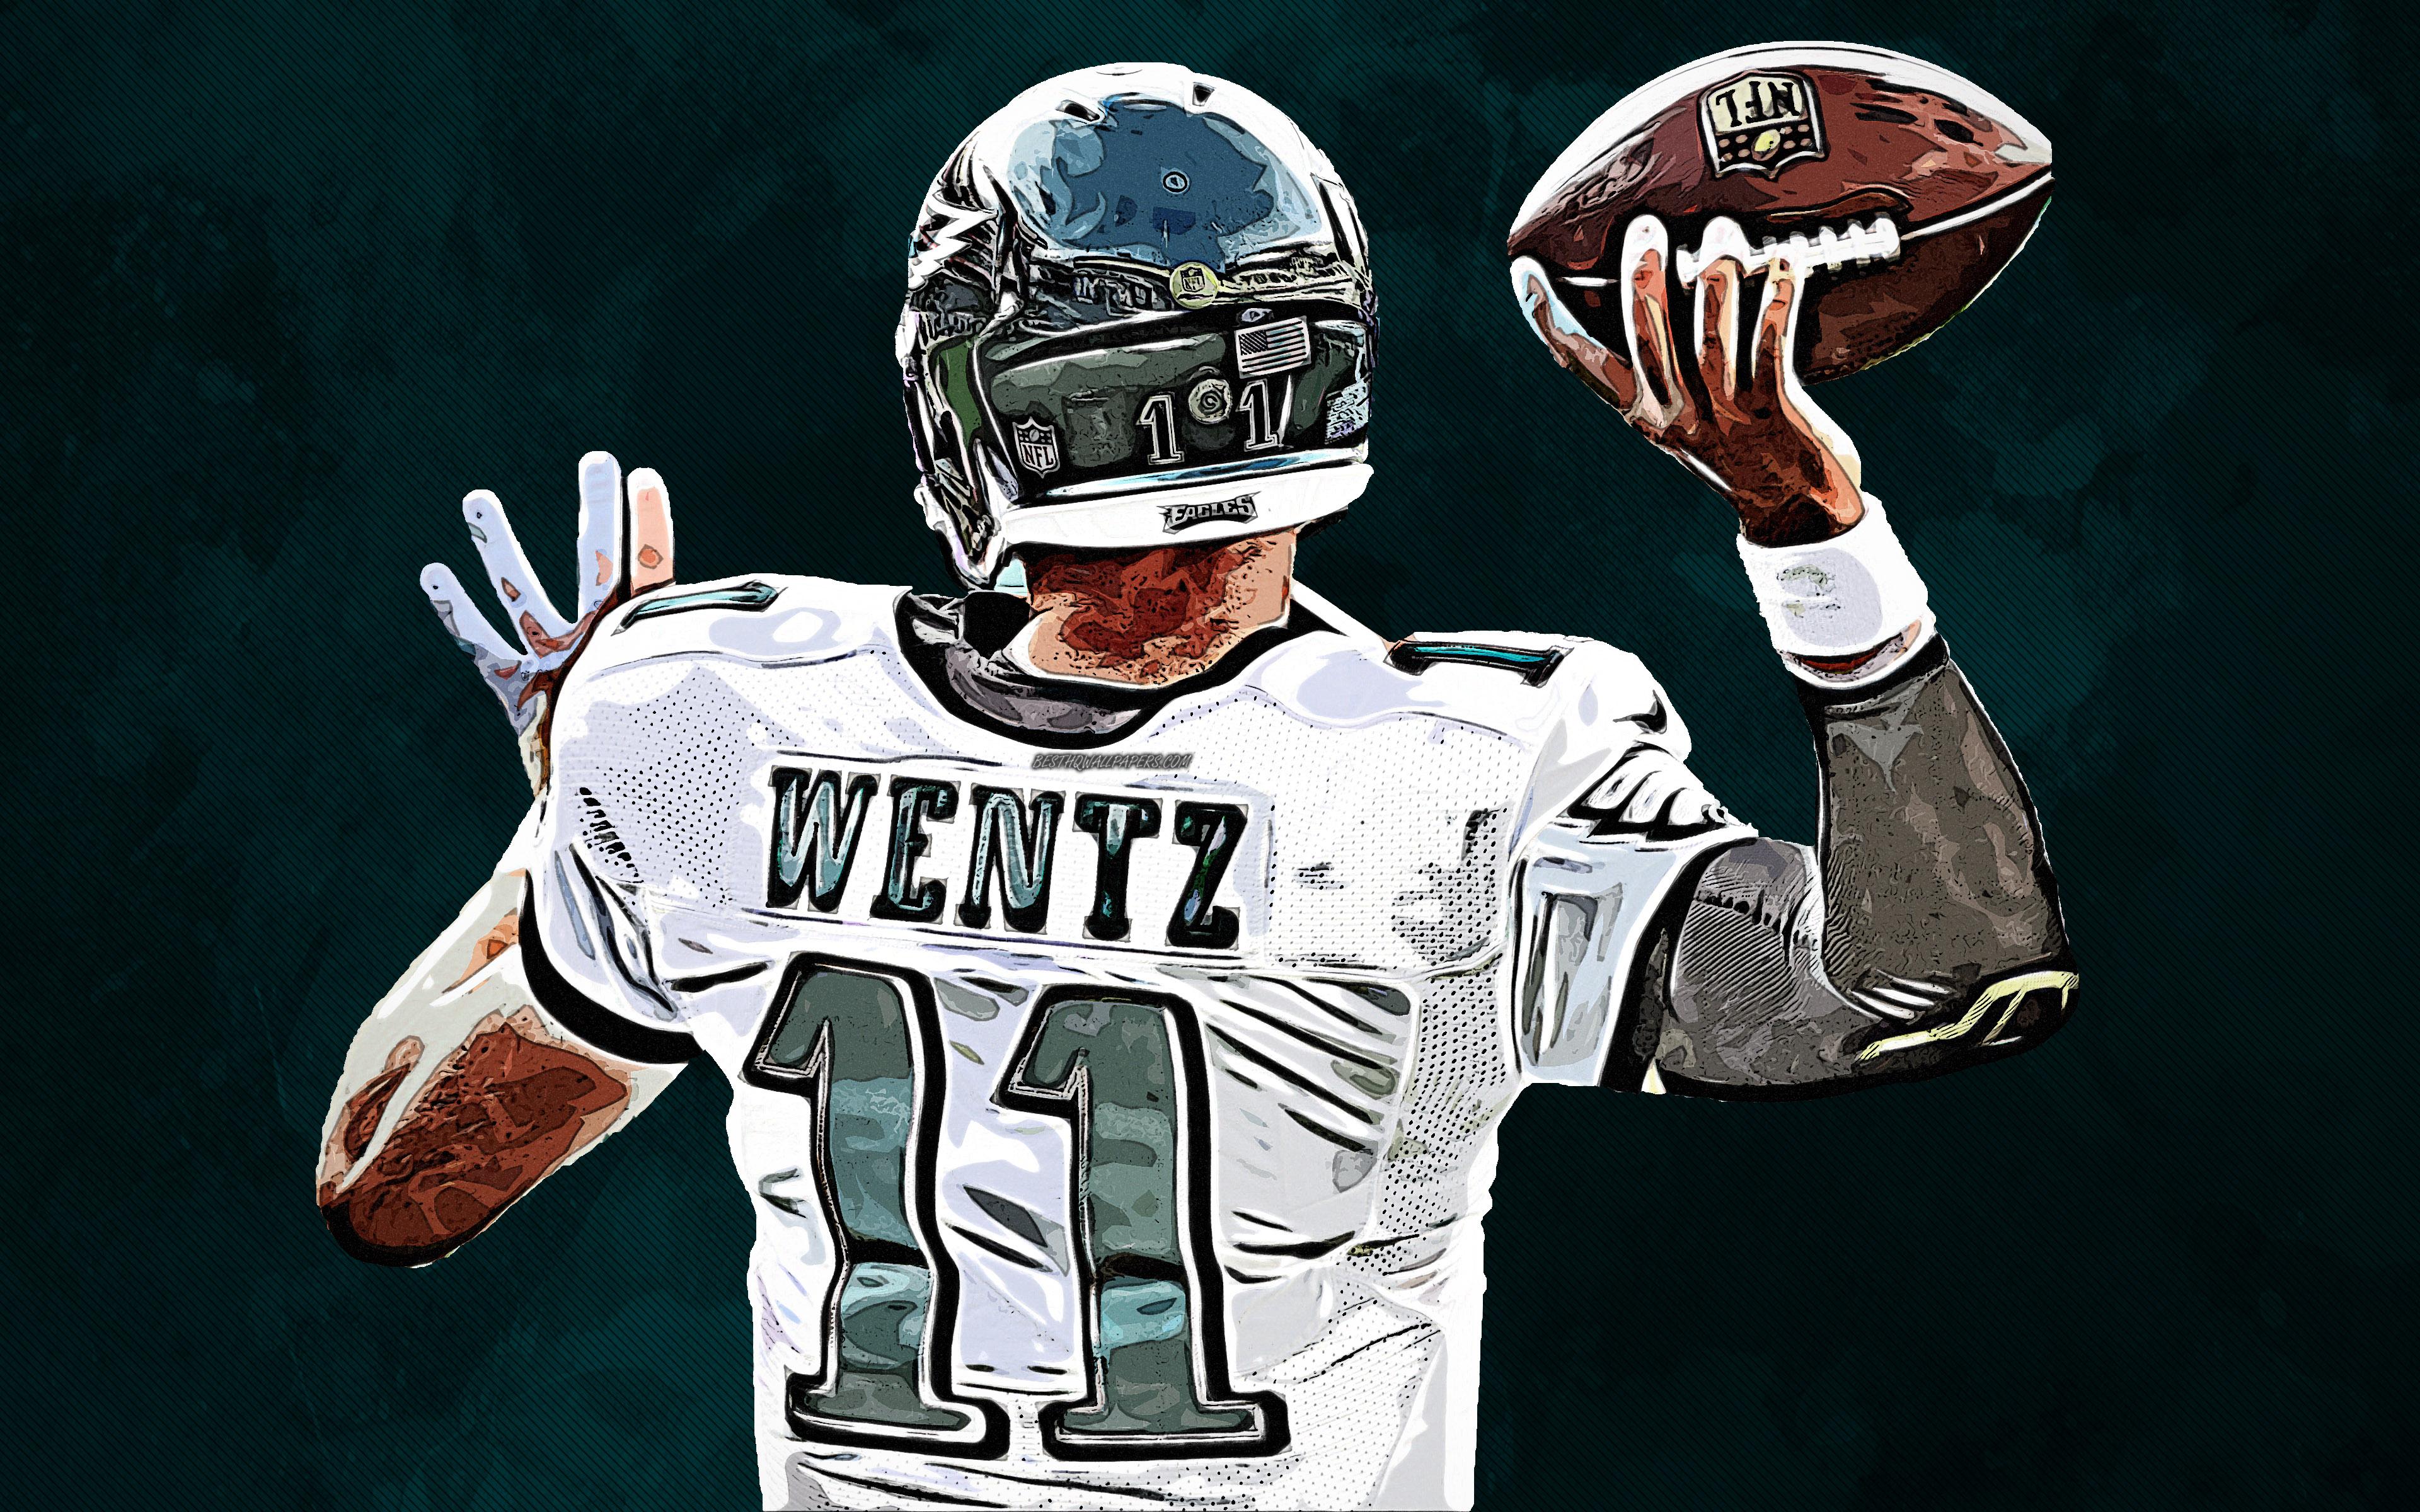 Download wallpapers Carson Wentz 4k art Philadelphia Eagles 3840x2400